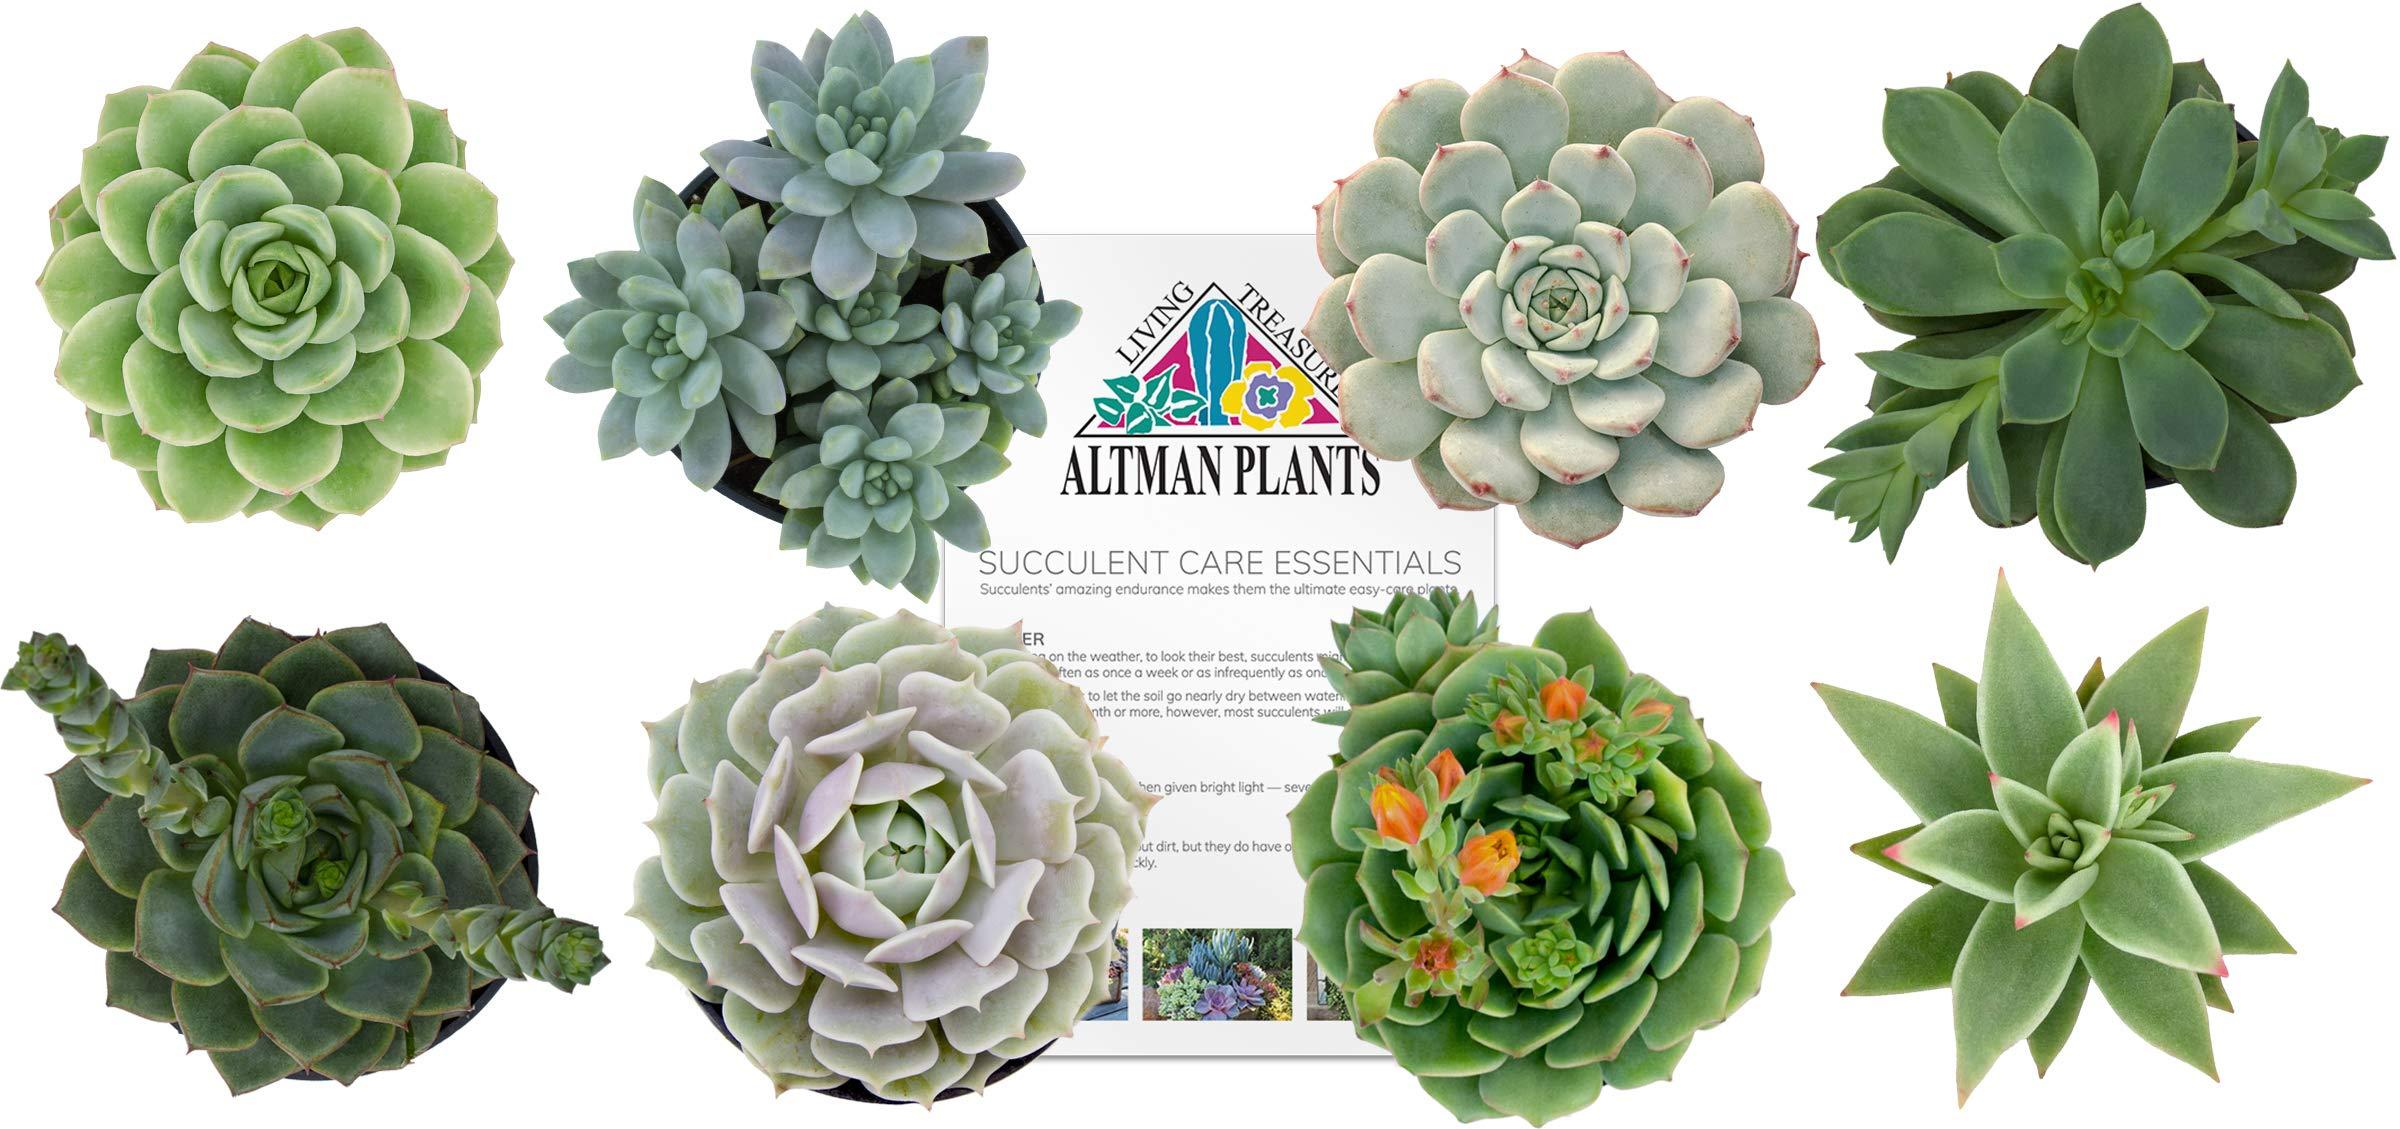 Altman Plants Assorted Live Succulents Flowering Rosette Collection Echeveria, sedeveria, perfect for party favors and arrangements, 2.5'', 8 Pack